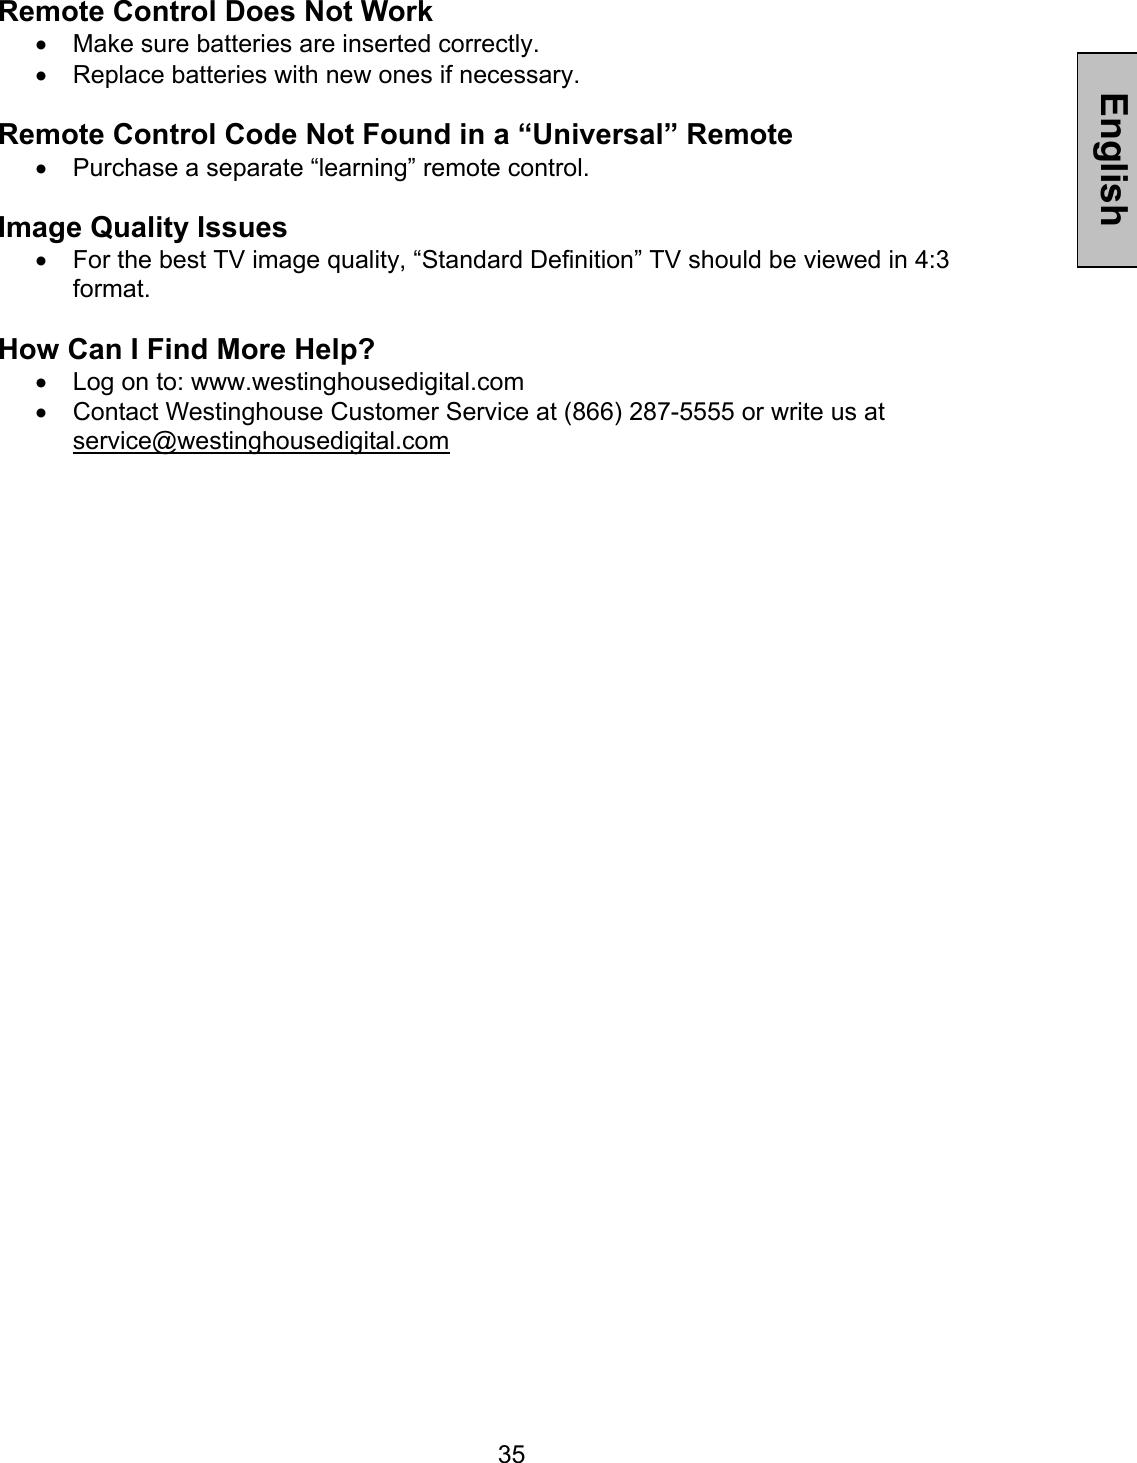 Westinghouse W3213 Hd Users Manual LT32 User Manuel Friday_01